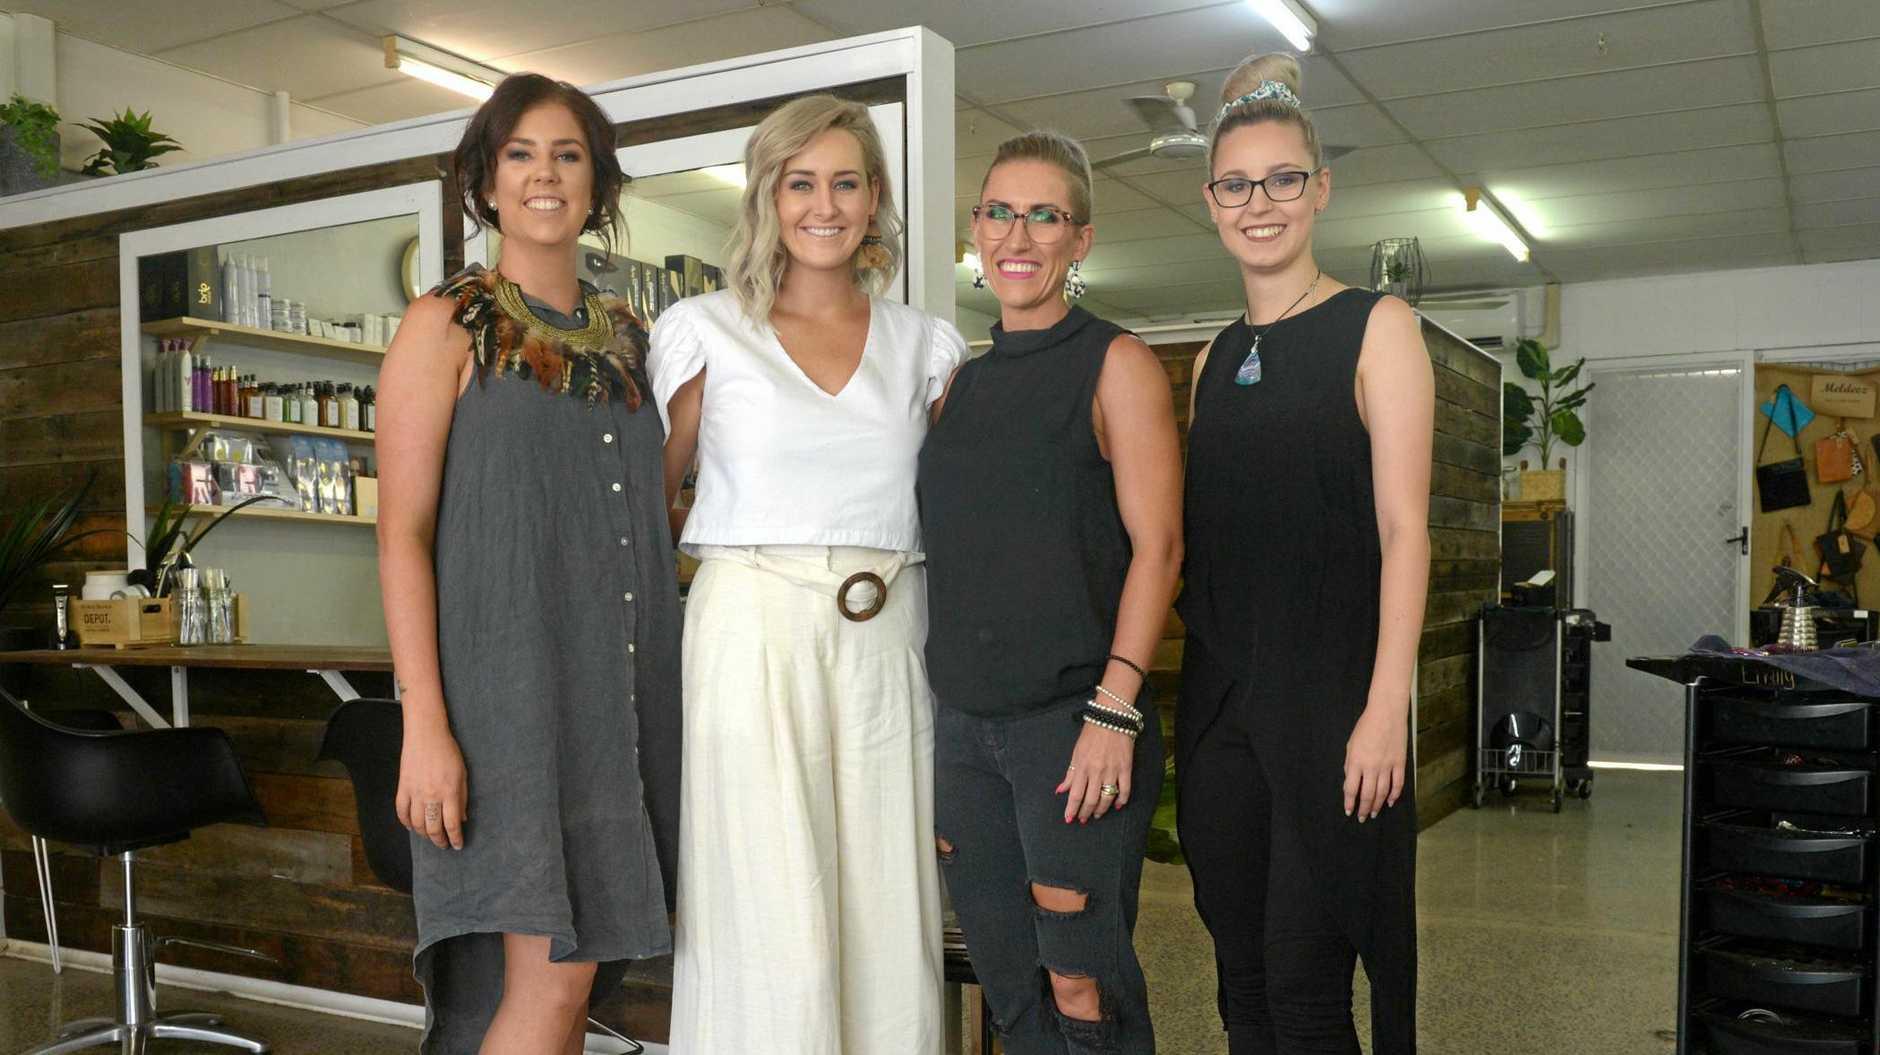 Emily Shkardoon, Larissa McIntosh, Sarah Vea Vea and Shannon Flanagan at Floss's Hair Studio